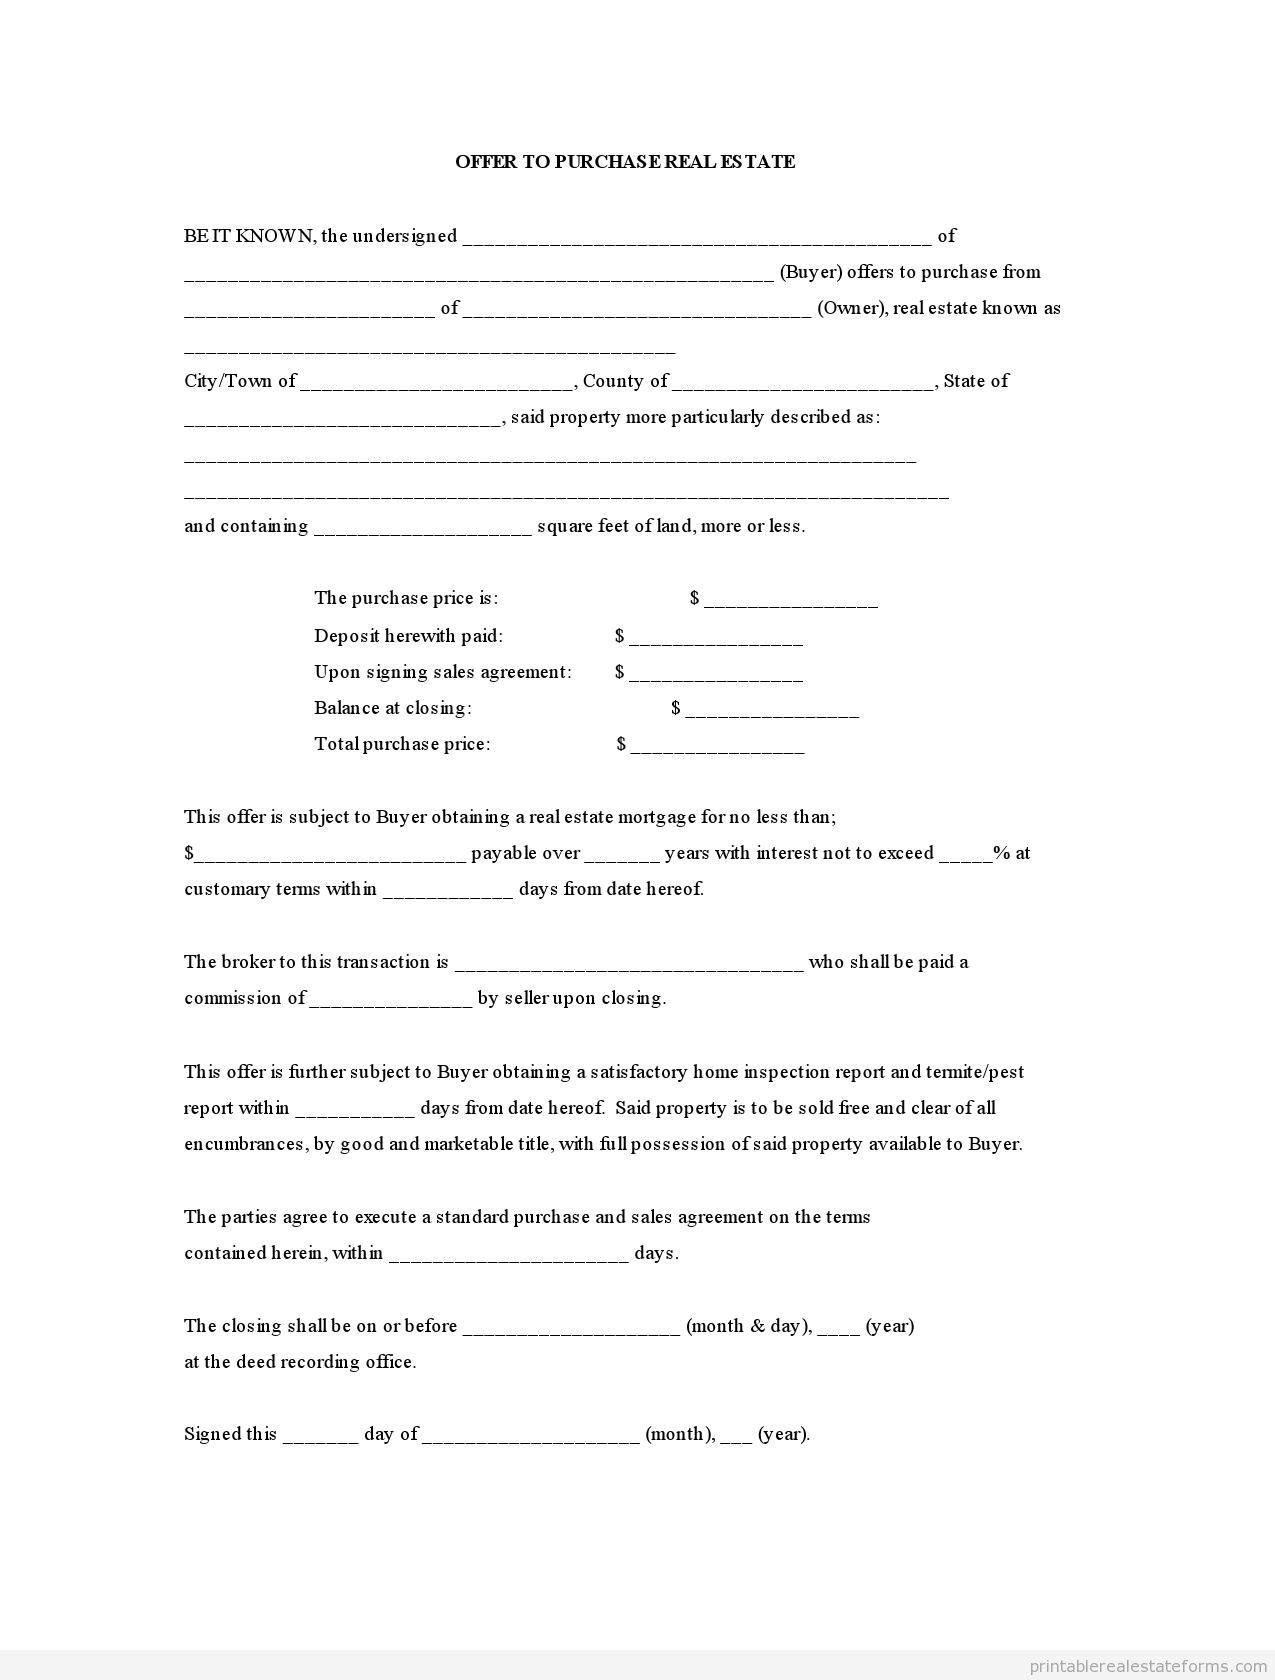 Online essay writing test image 1